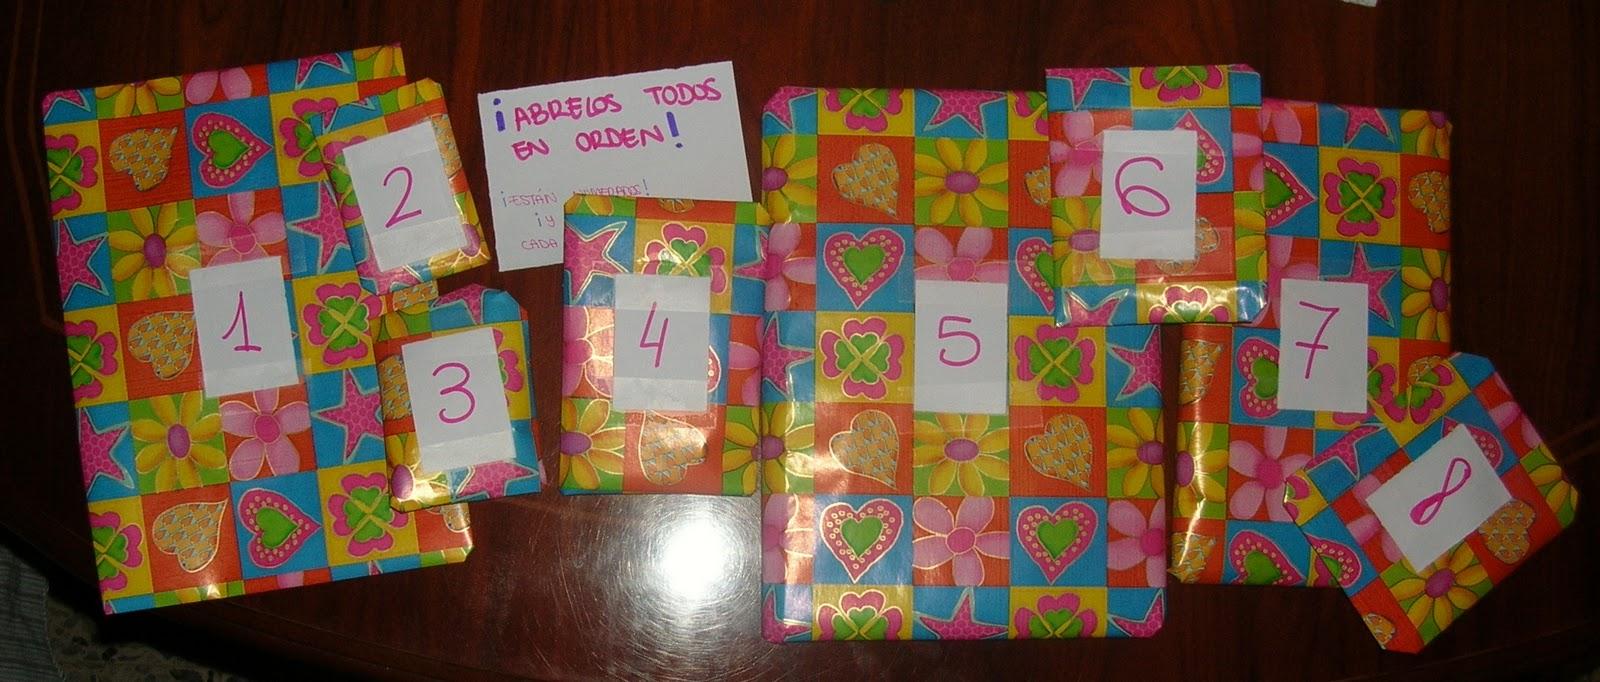 Sonia manualidades regalitos swap amigo invisible - Manualidades para un amigo invisible ...